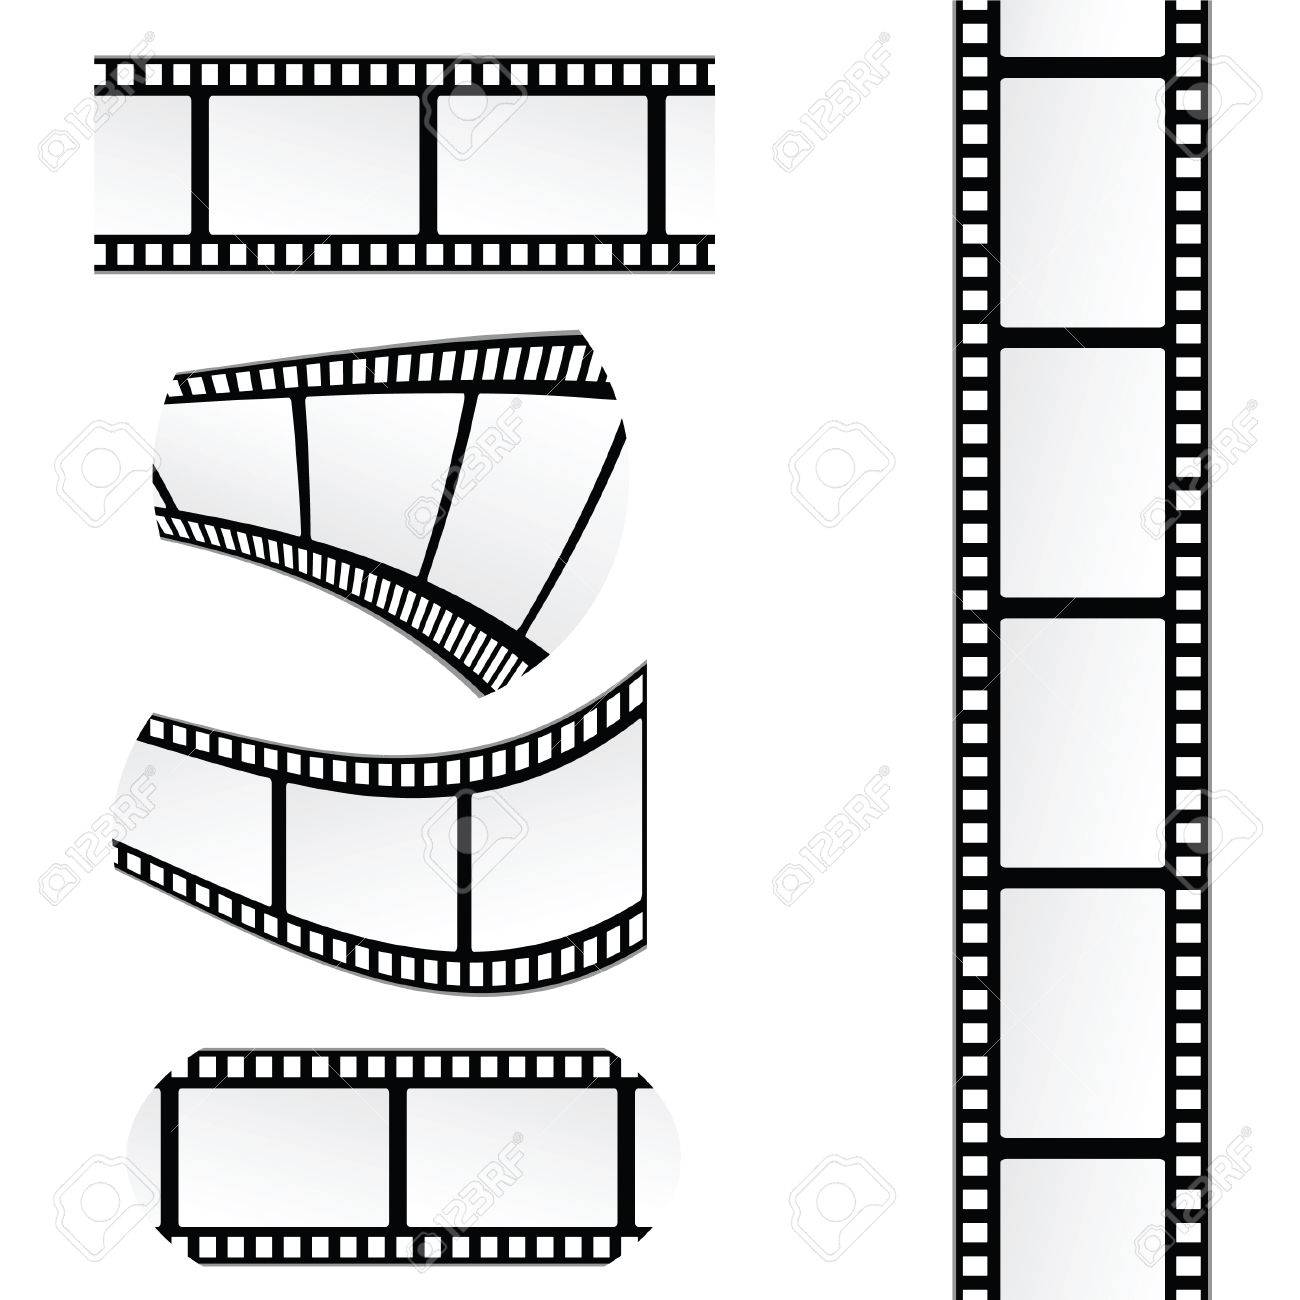 film tape roll vector illustration royalty free cliparts vectors